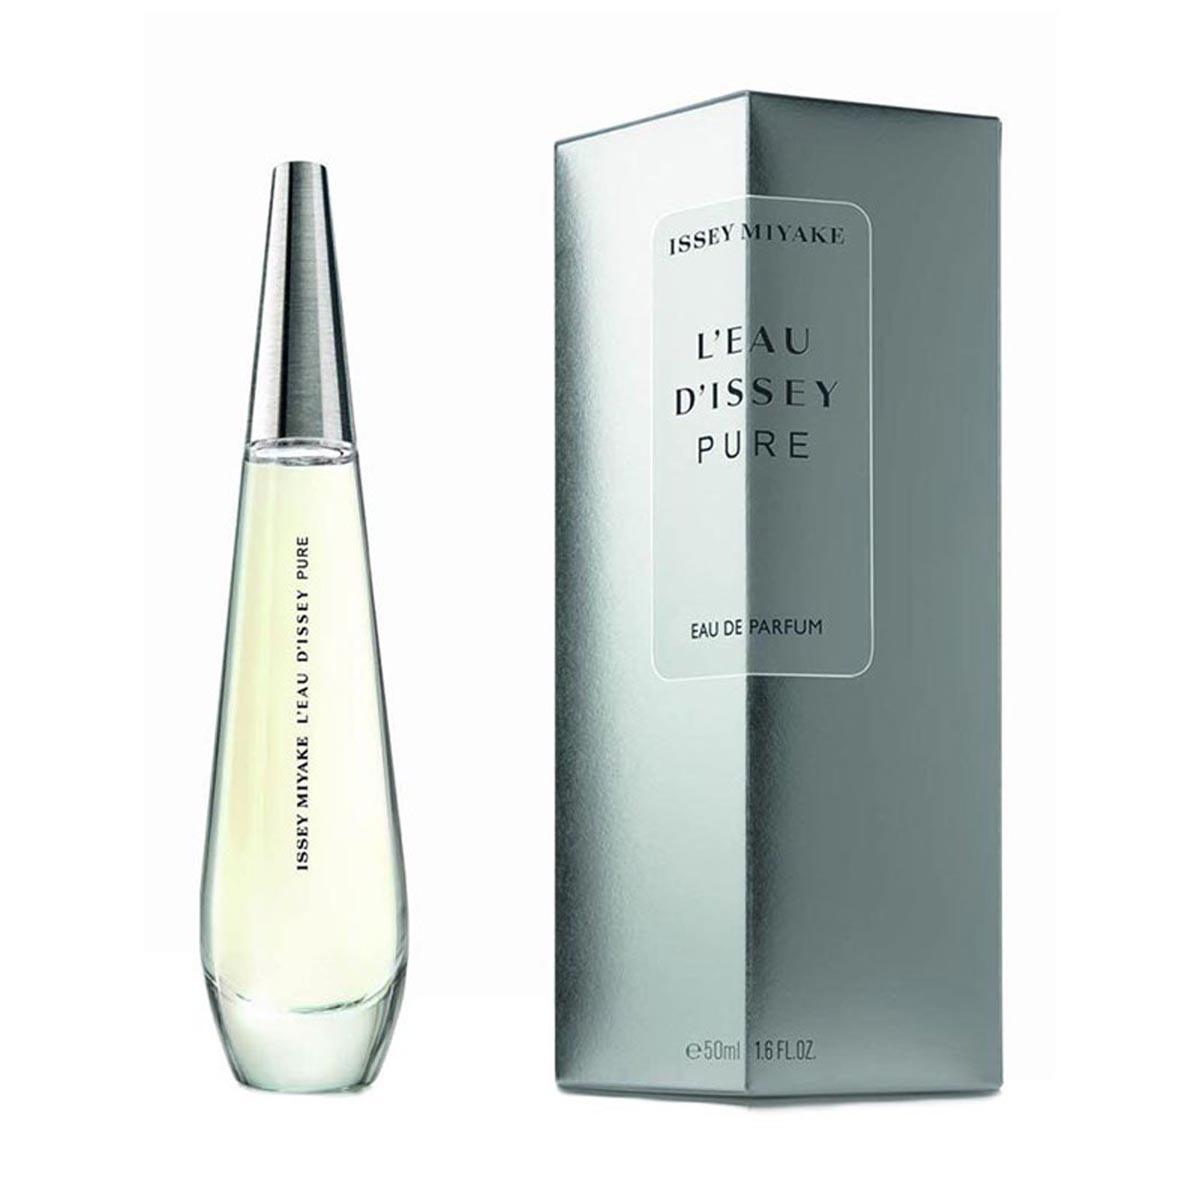 Issey miyake l eau d issey pure eau de parfum 100ml con funda vaporizador